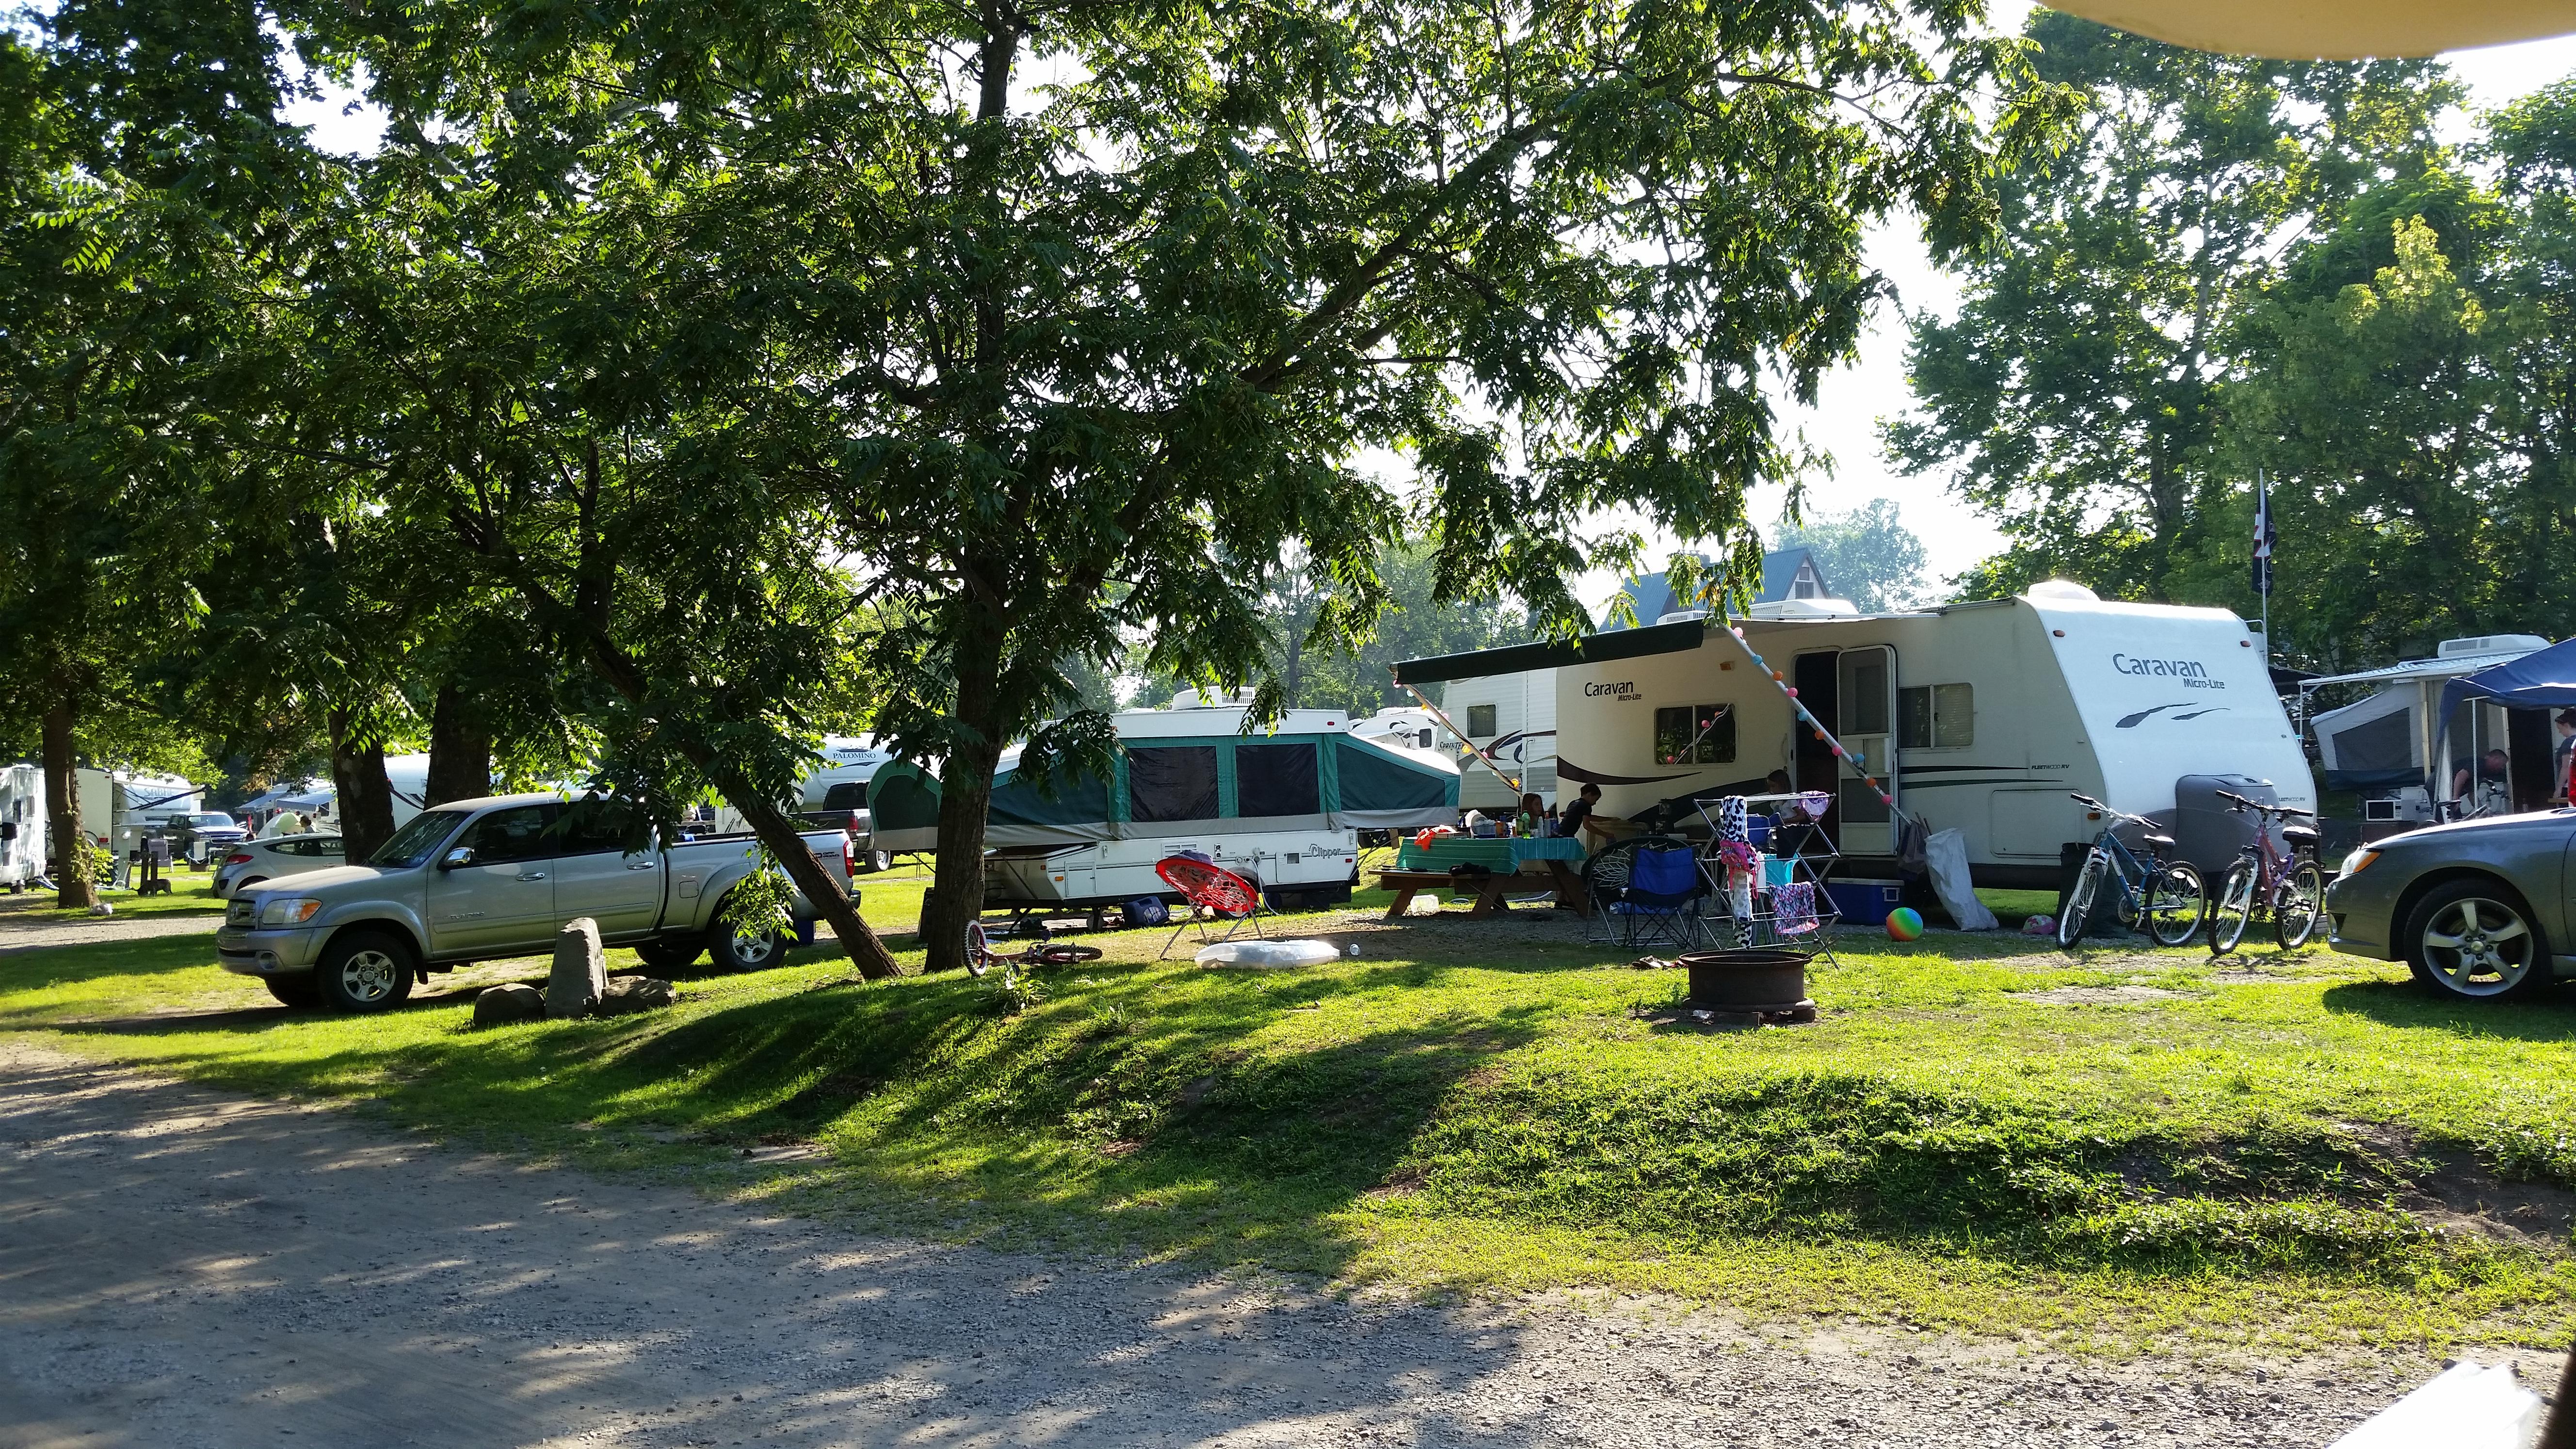 connellsville pennsylvania rv camping sites uniontown koa